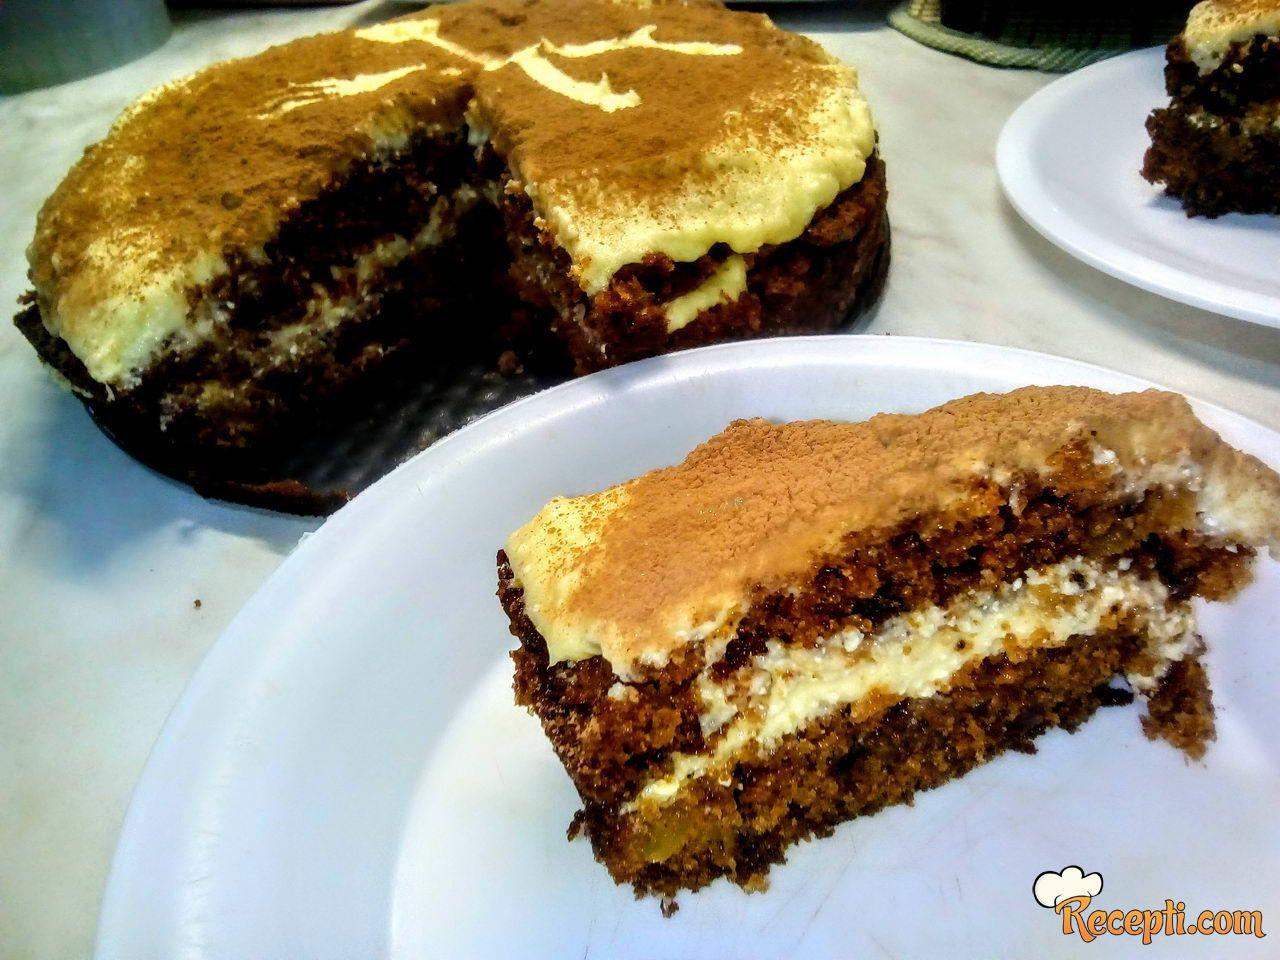 Torta sa šargarepom i ananasom & Carrot and pineapple cake